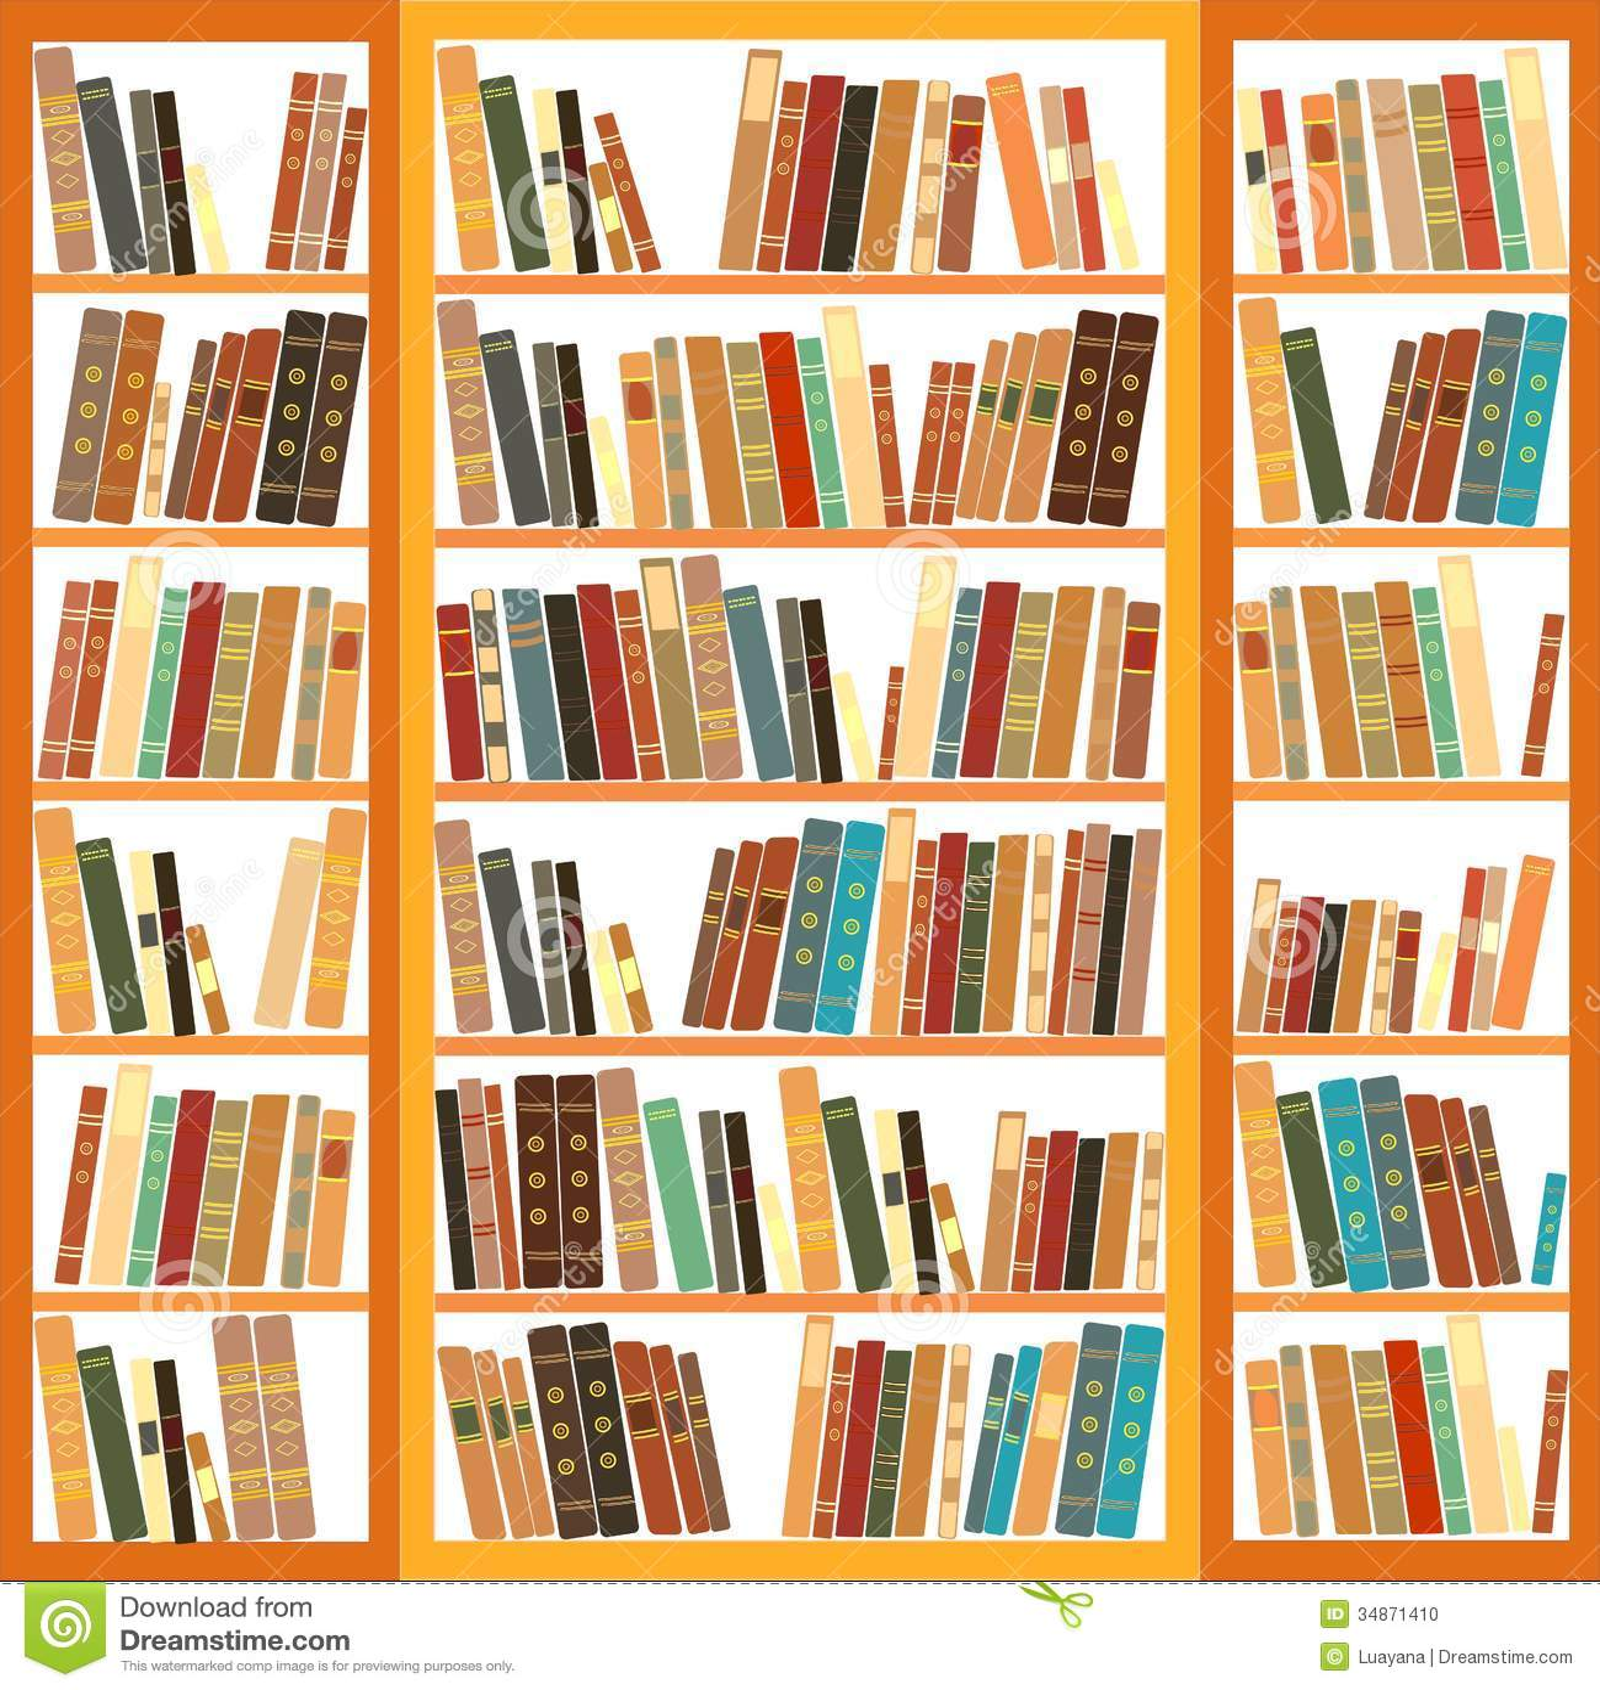 Bookshelf With Books ~ Bookcase full of books stock photo image classic